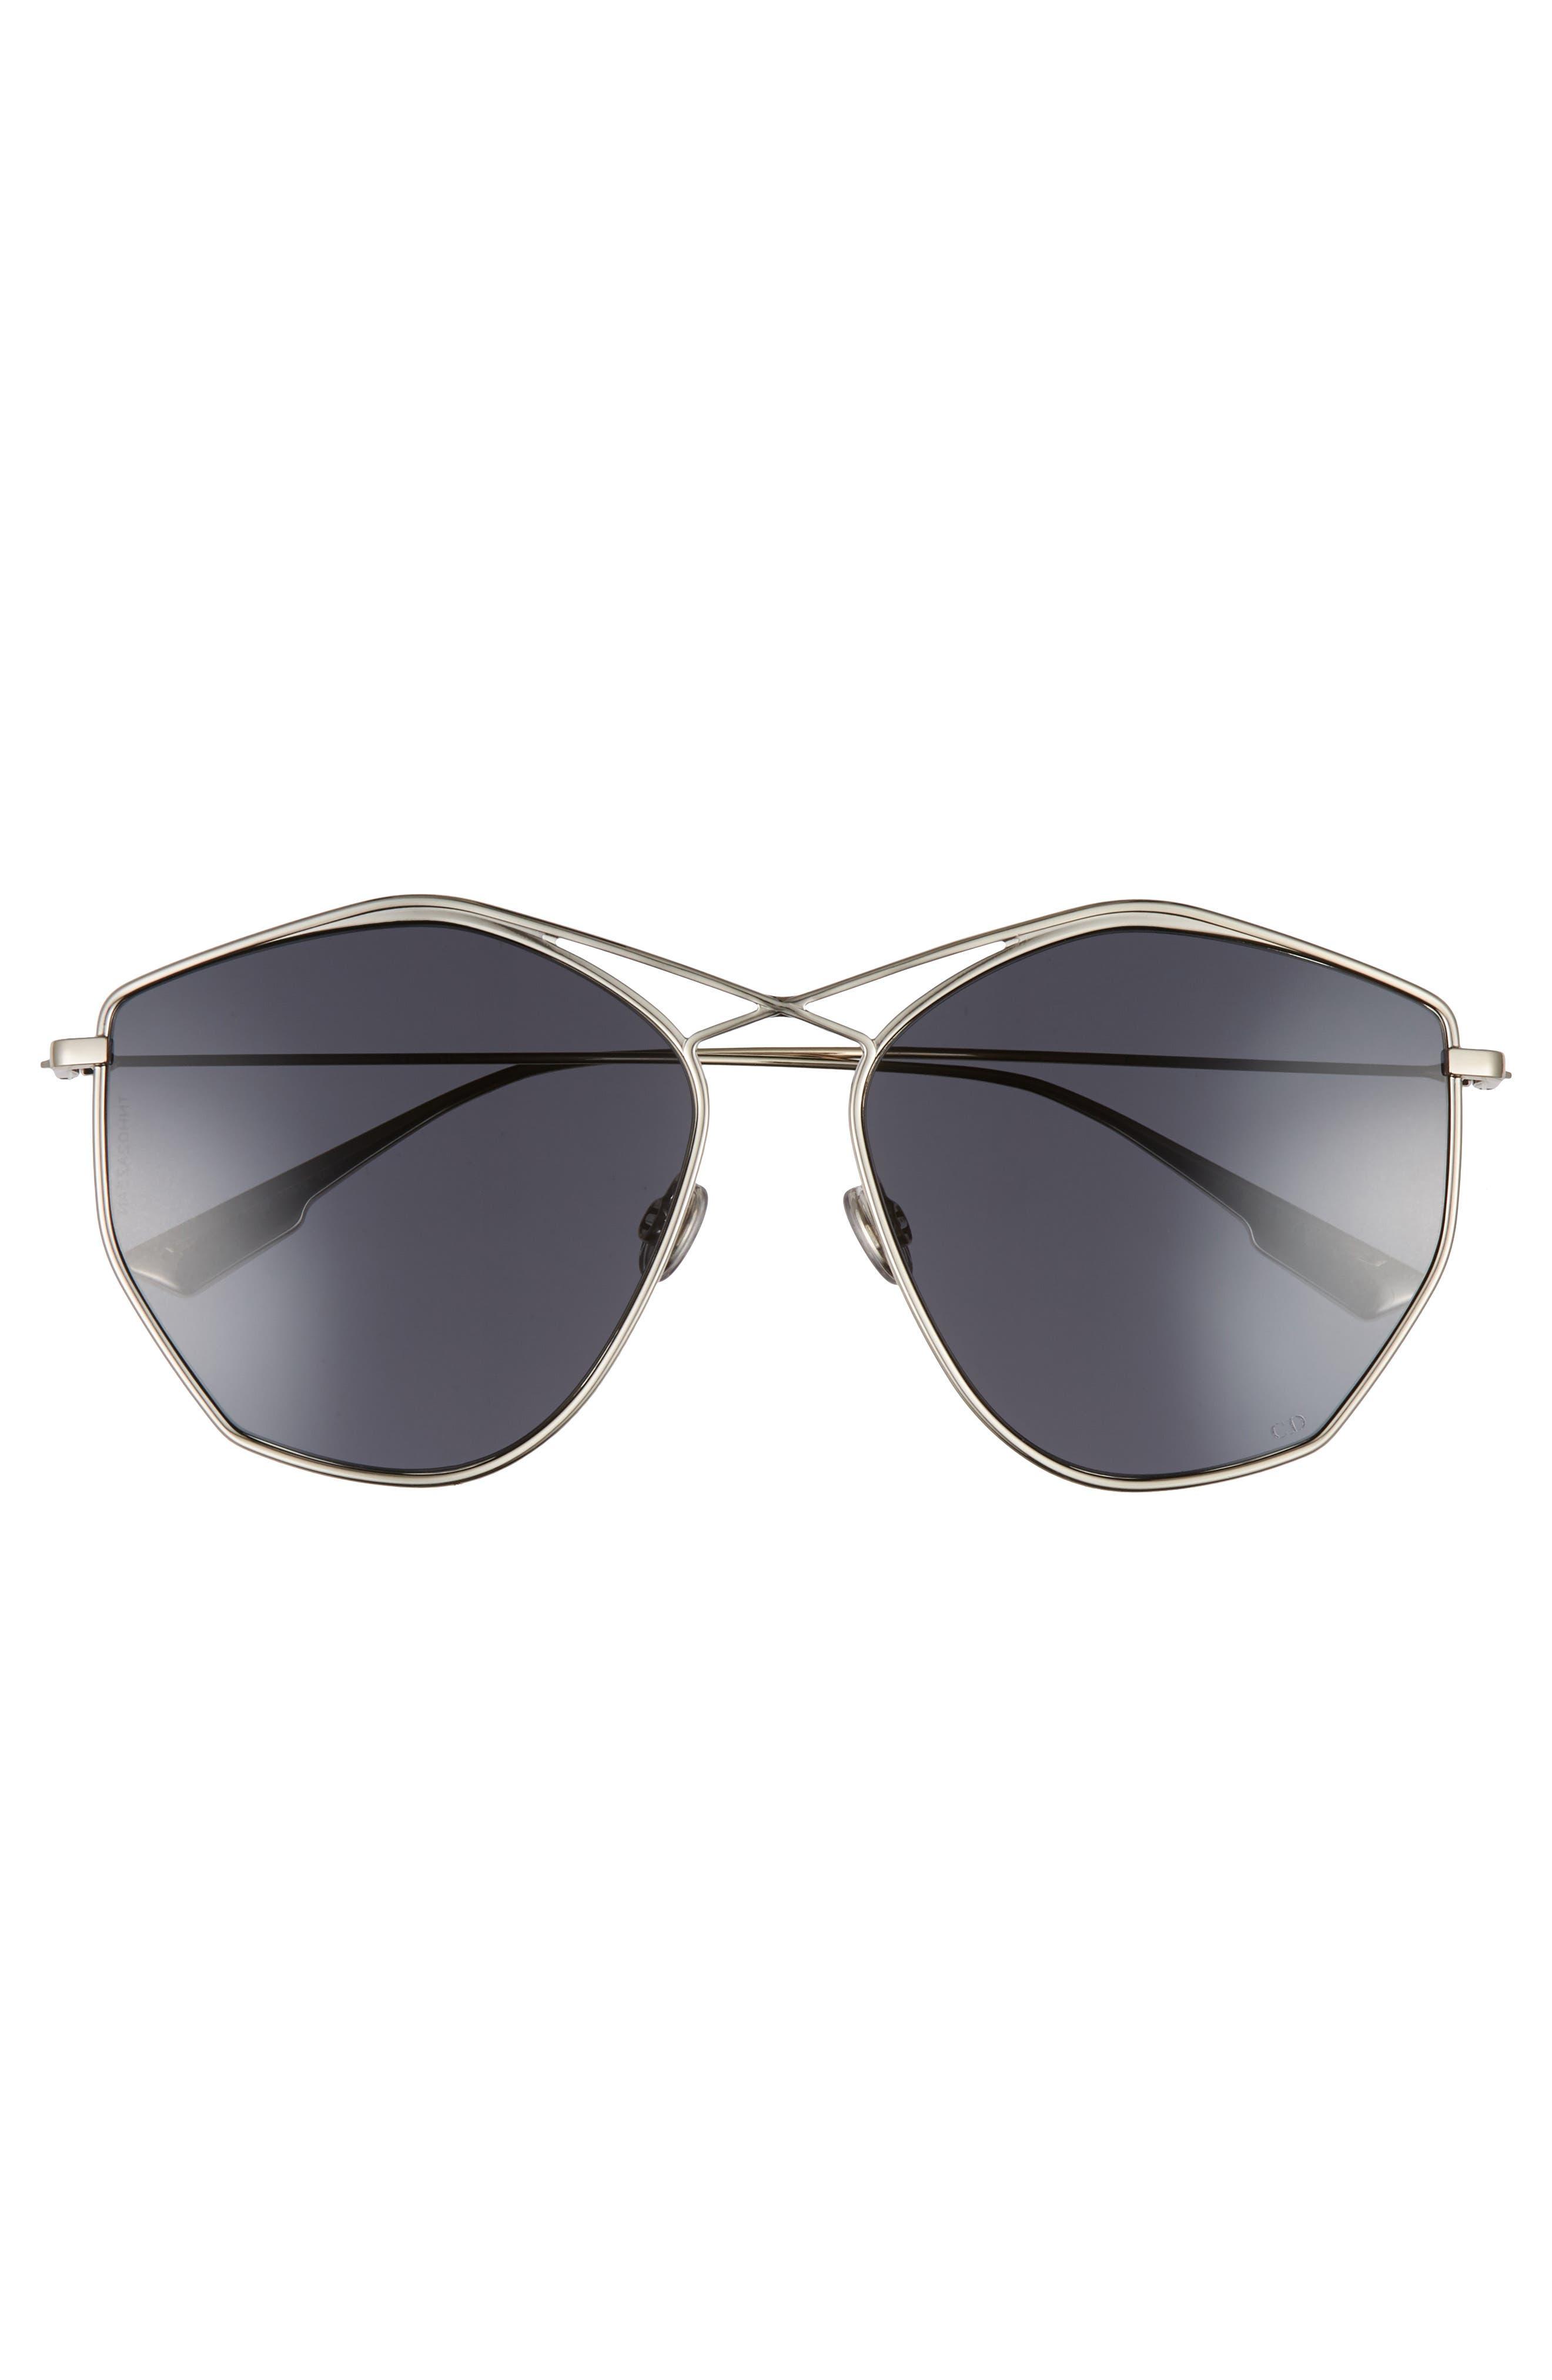 59mm Metal Sunglasses,                             Alternate thumbnail 3, color,                             LIGHT GOLD